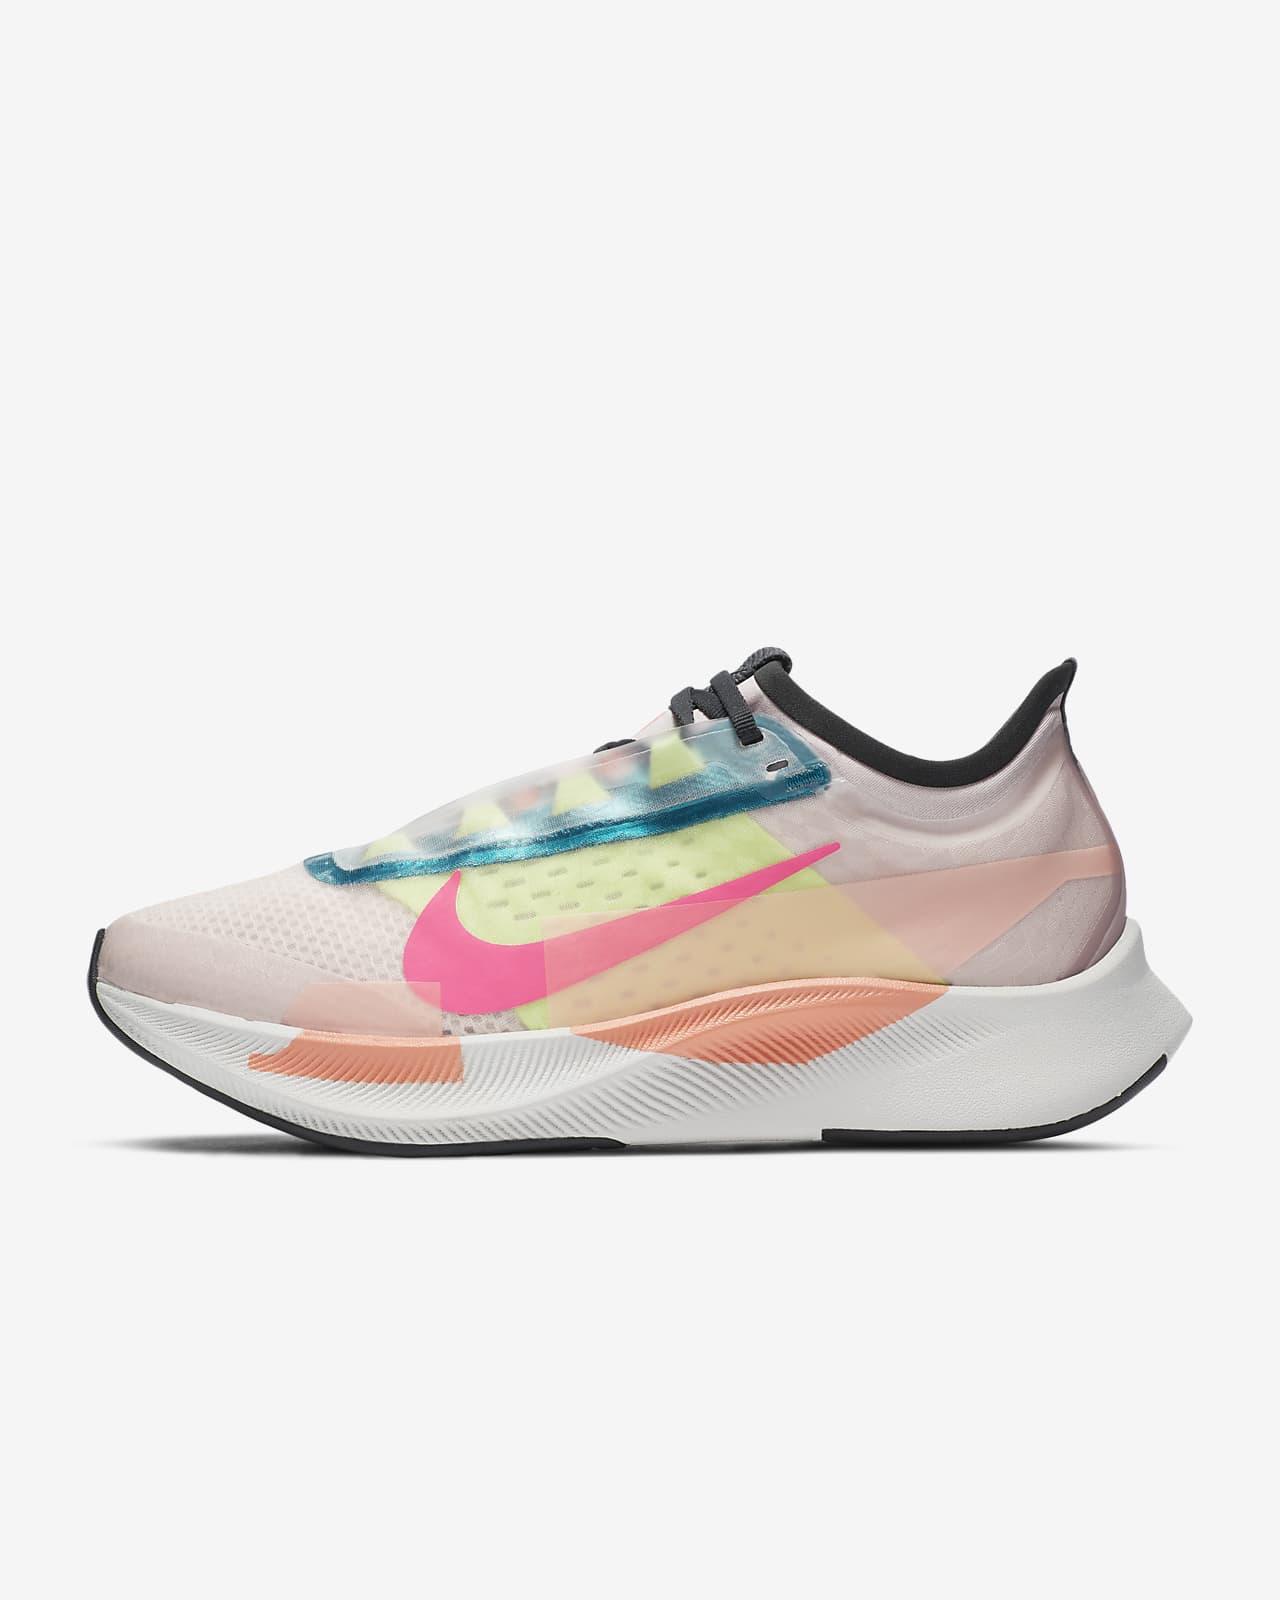 Nike Zoom Fly 3 Premium Damen-Laufschuh